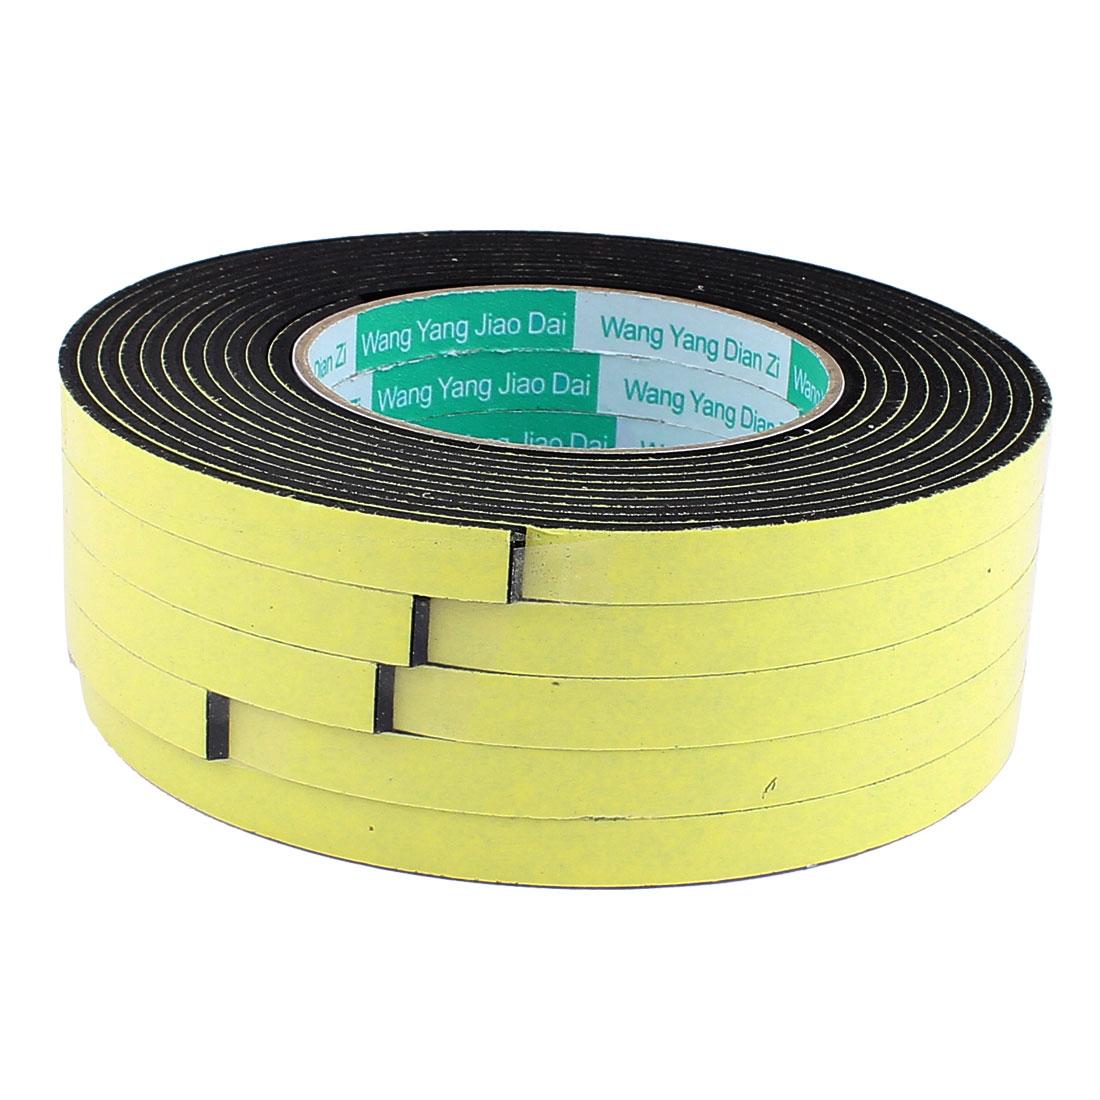 5 Pcs 1CM Width 4M Length 3MM Thick Single Sided Sealing Shockproof Sponge Tape